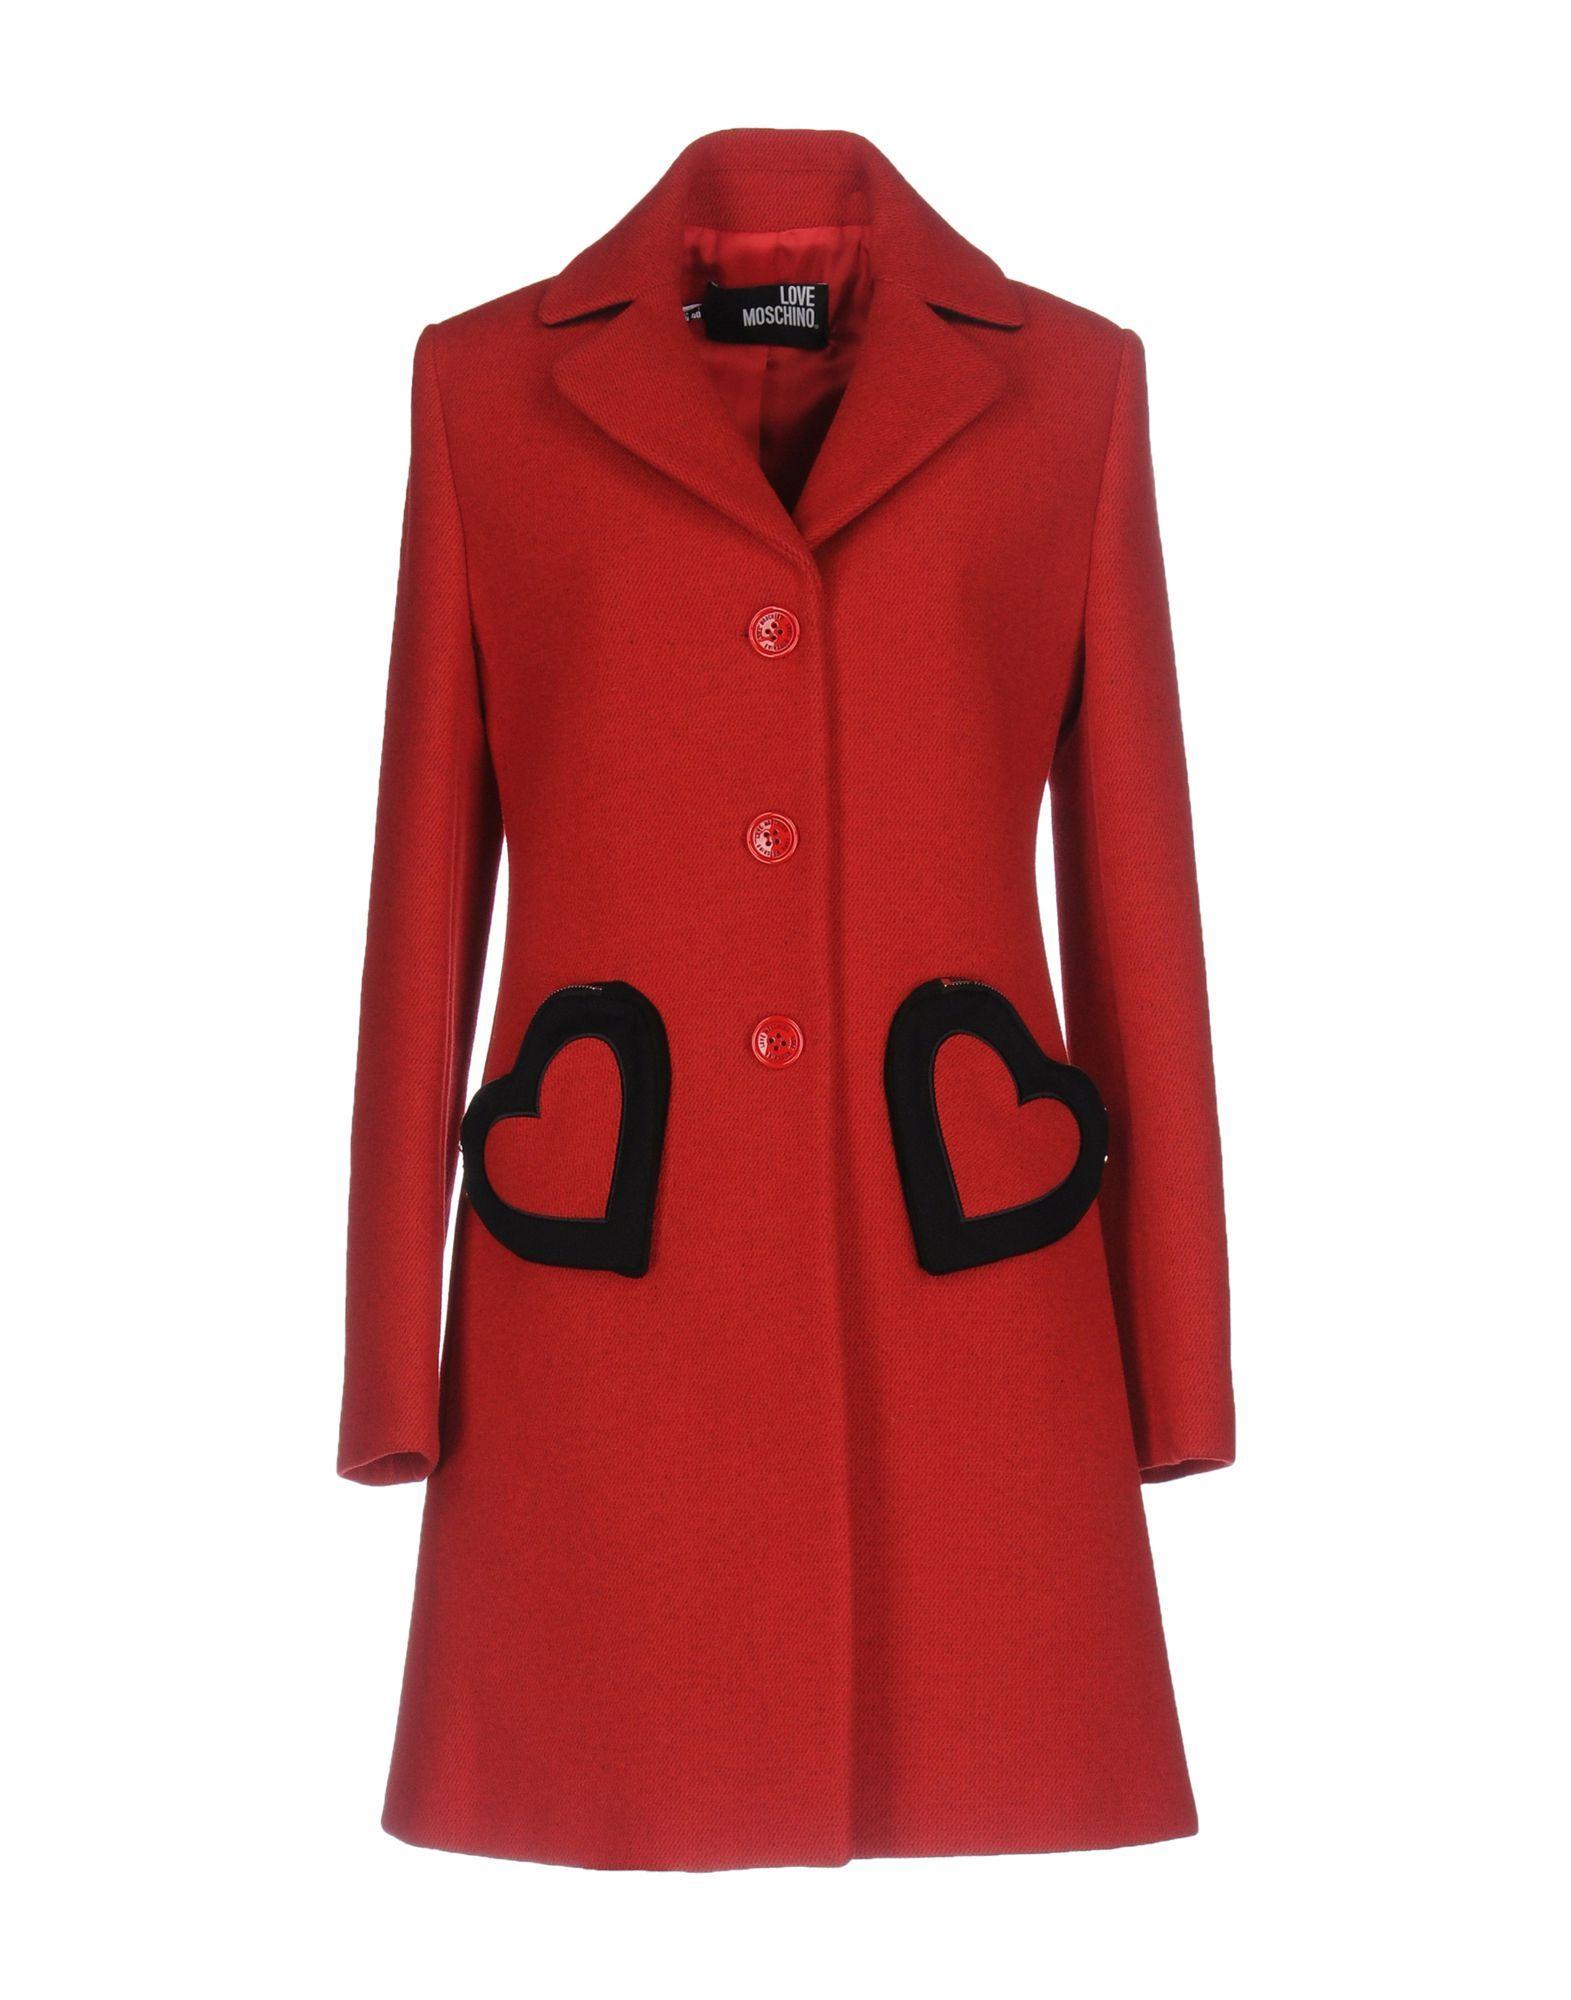 0638cf4927902 Love Moschino Full-Length Jacket - Women Love Moschino Full-Length Jackets  online on YOOX United States - 41737962